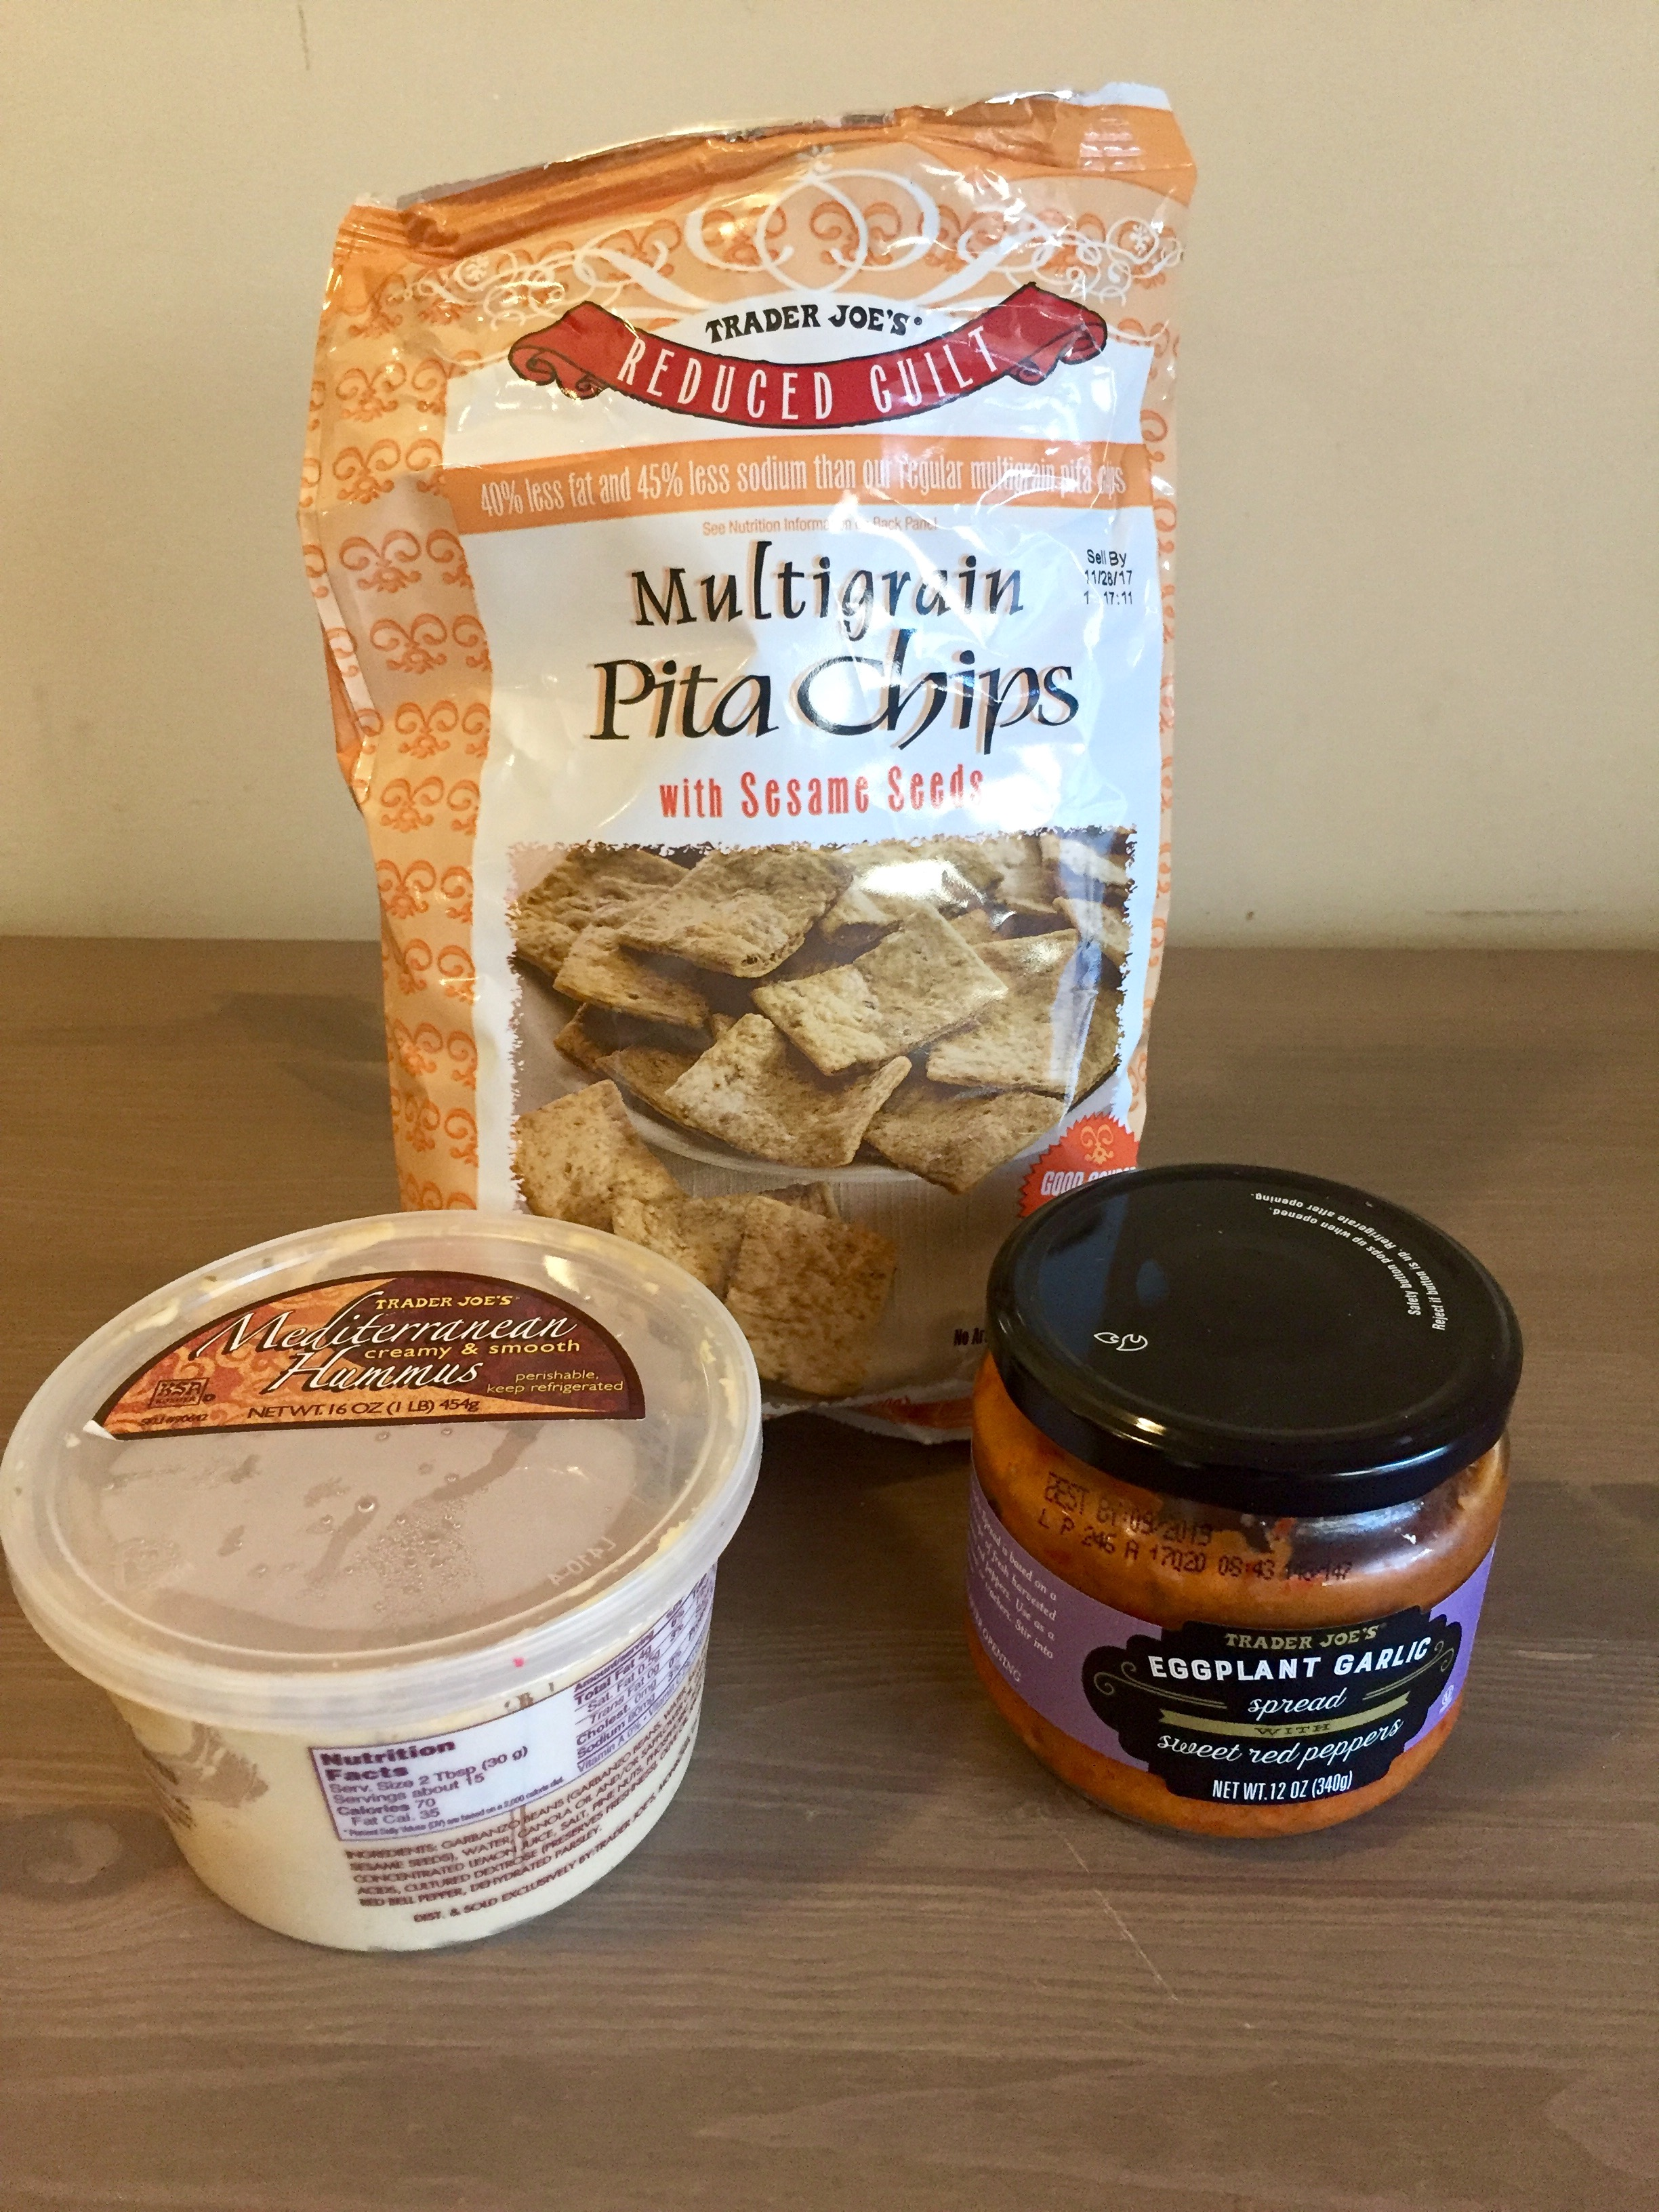 AAY Nutrition Trader Joe's Hummus & Eggplant Dip